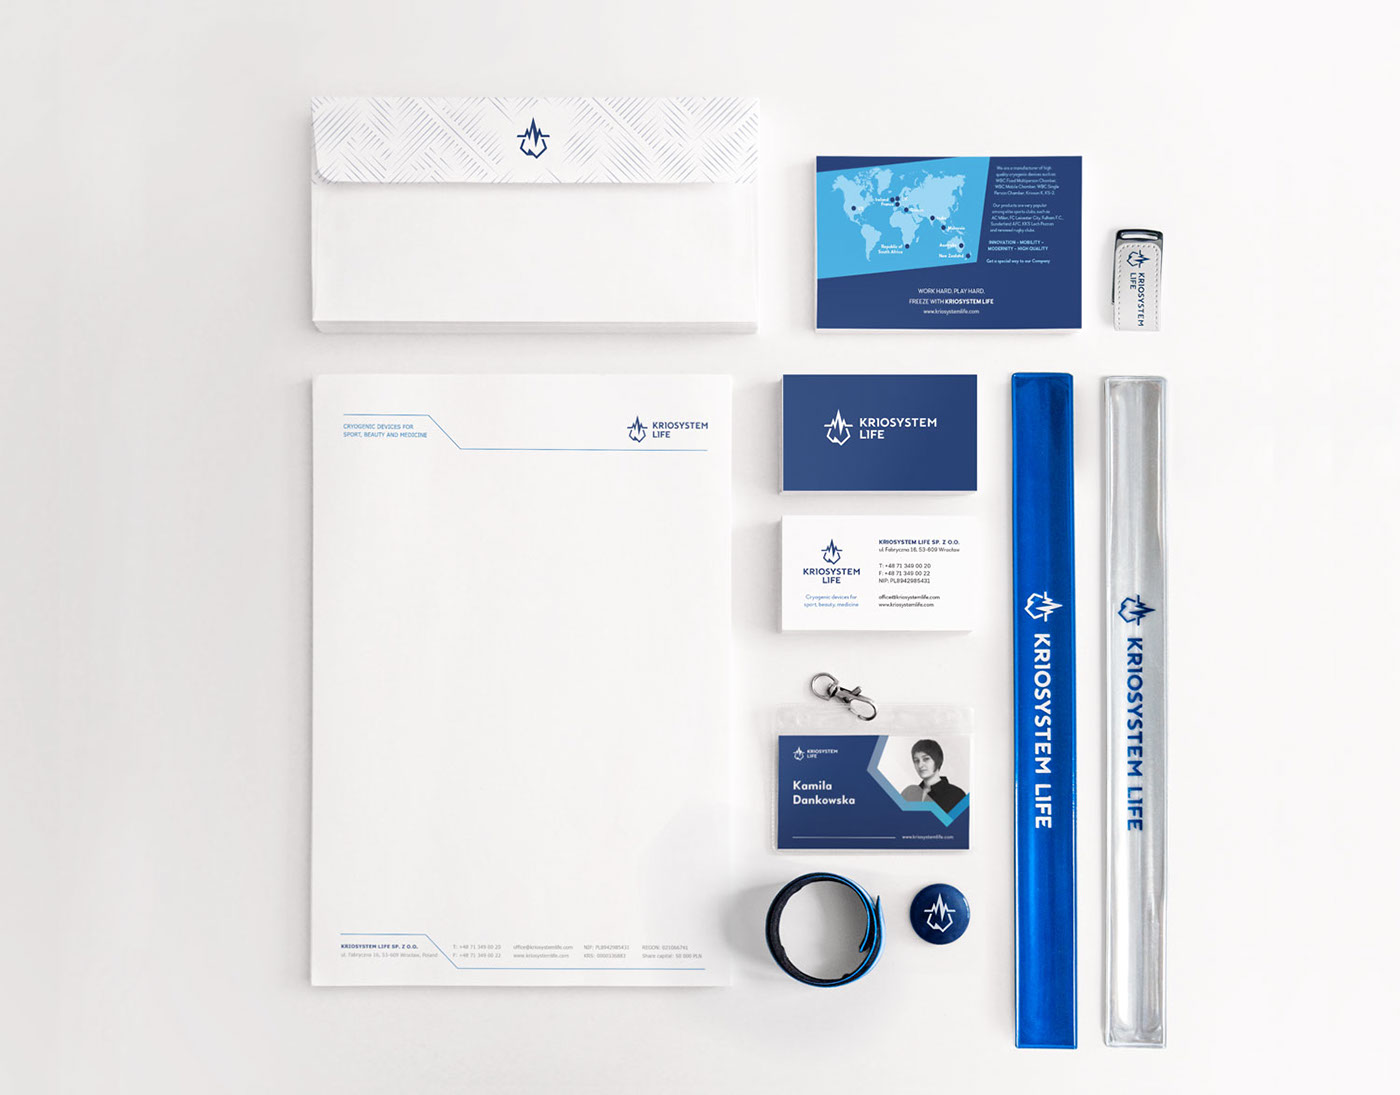 cryogenic,cryochamber,ice,frost,cryotherapy,sport,medicine,beauty,logo,Corporate Identity